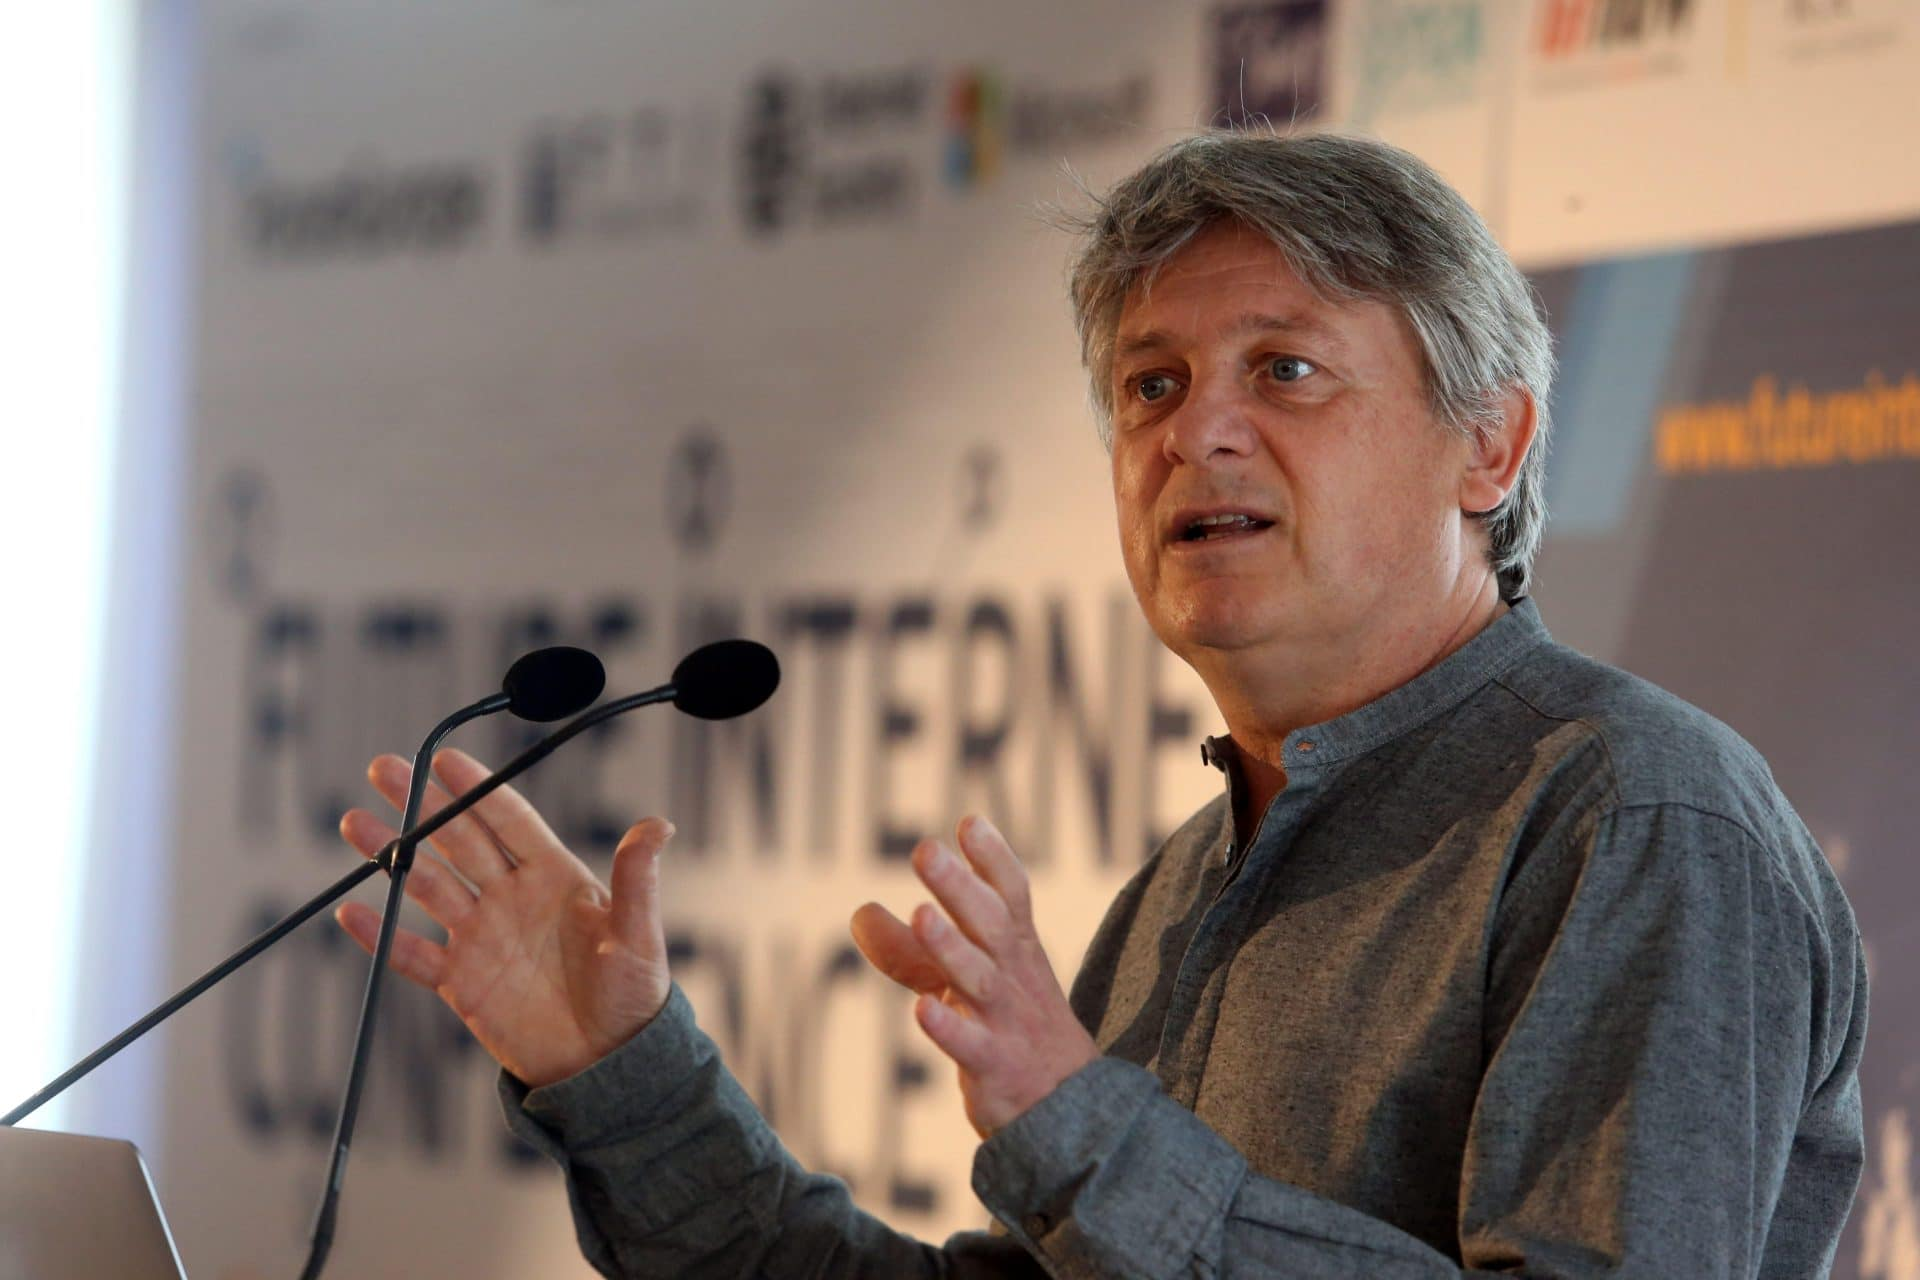 rob-van-kranenburg-keynote-speaker